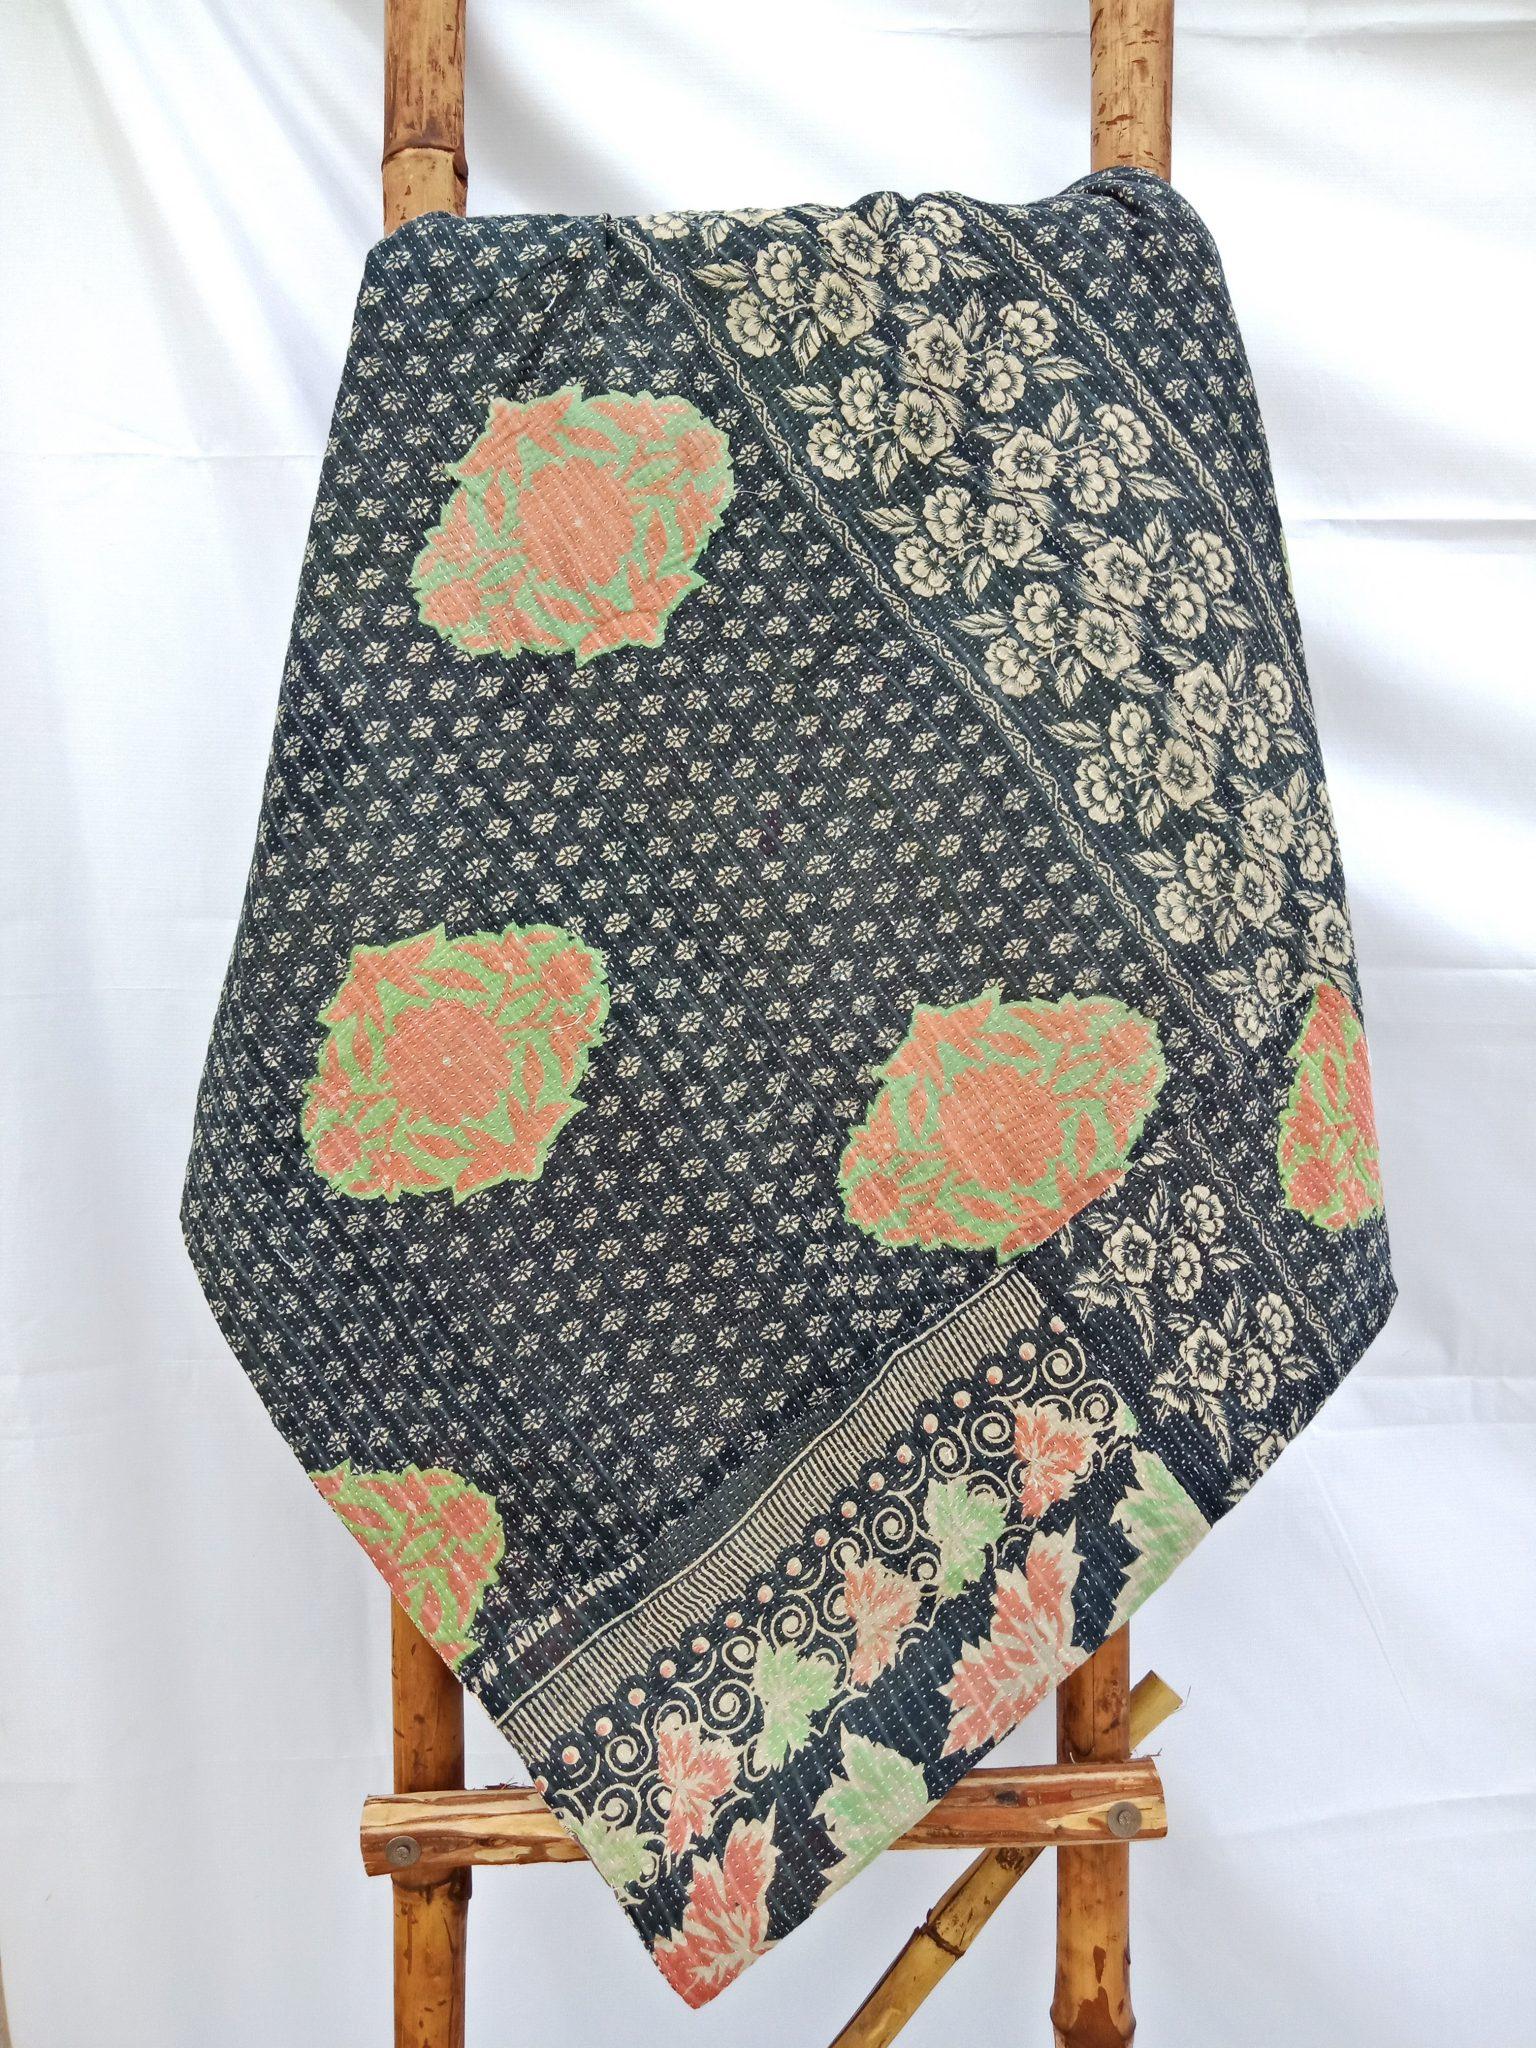 Vintage Kantha Quilt by Samira